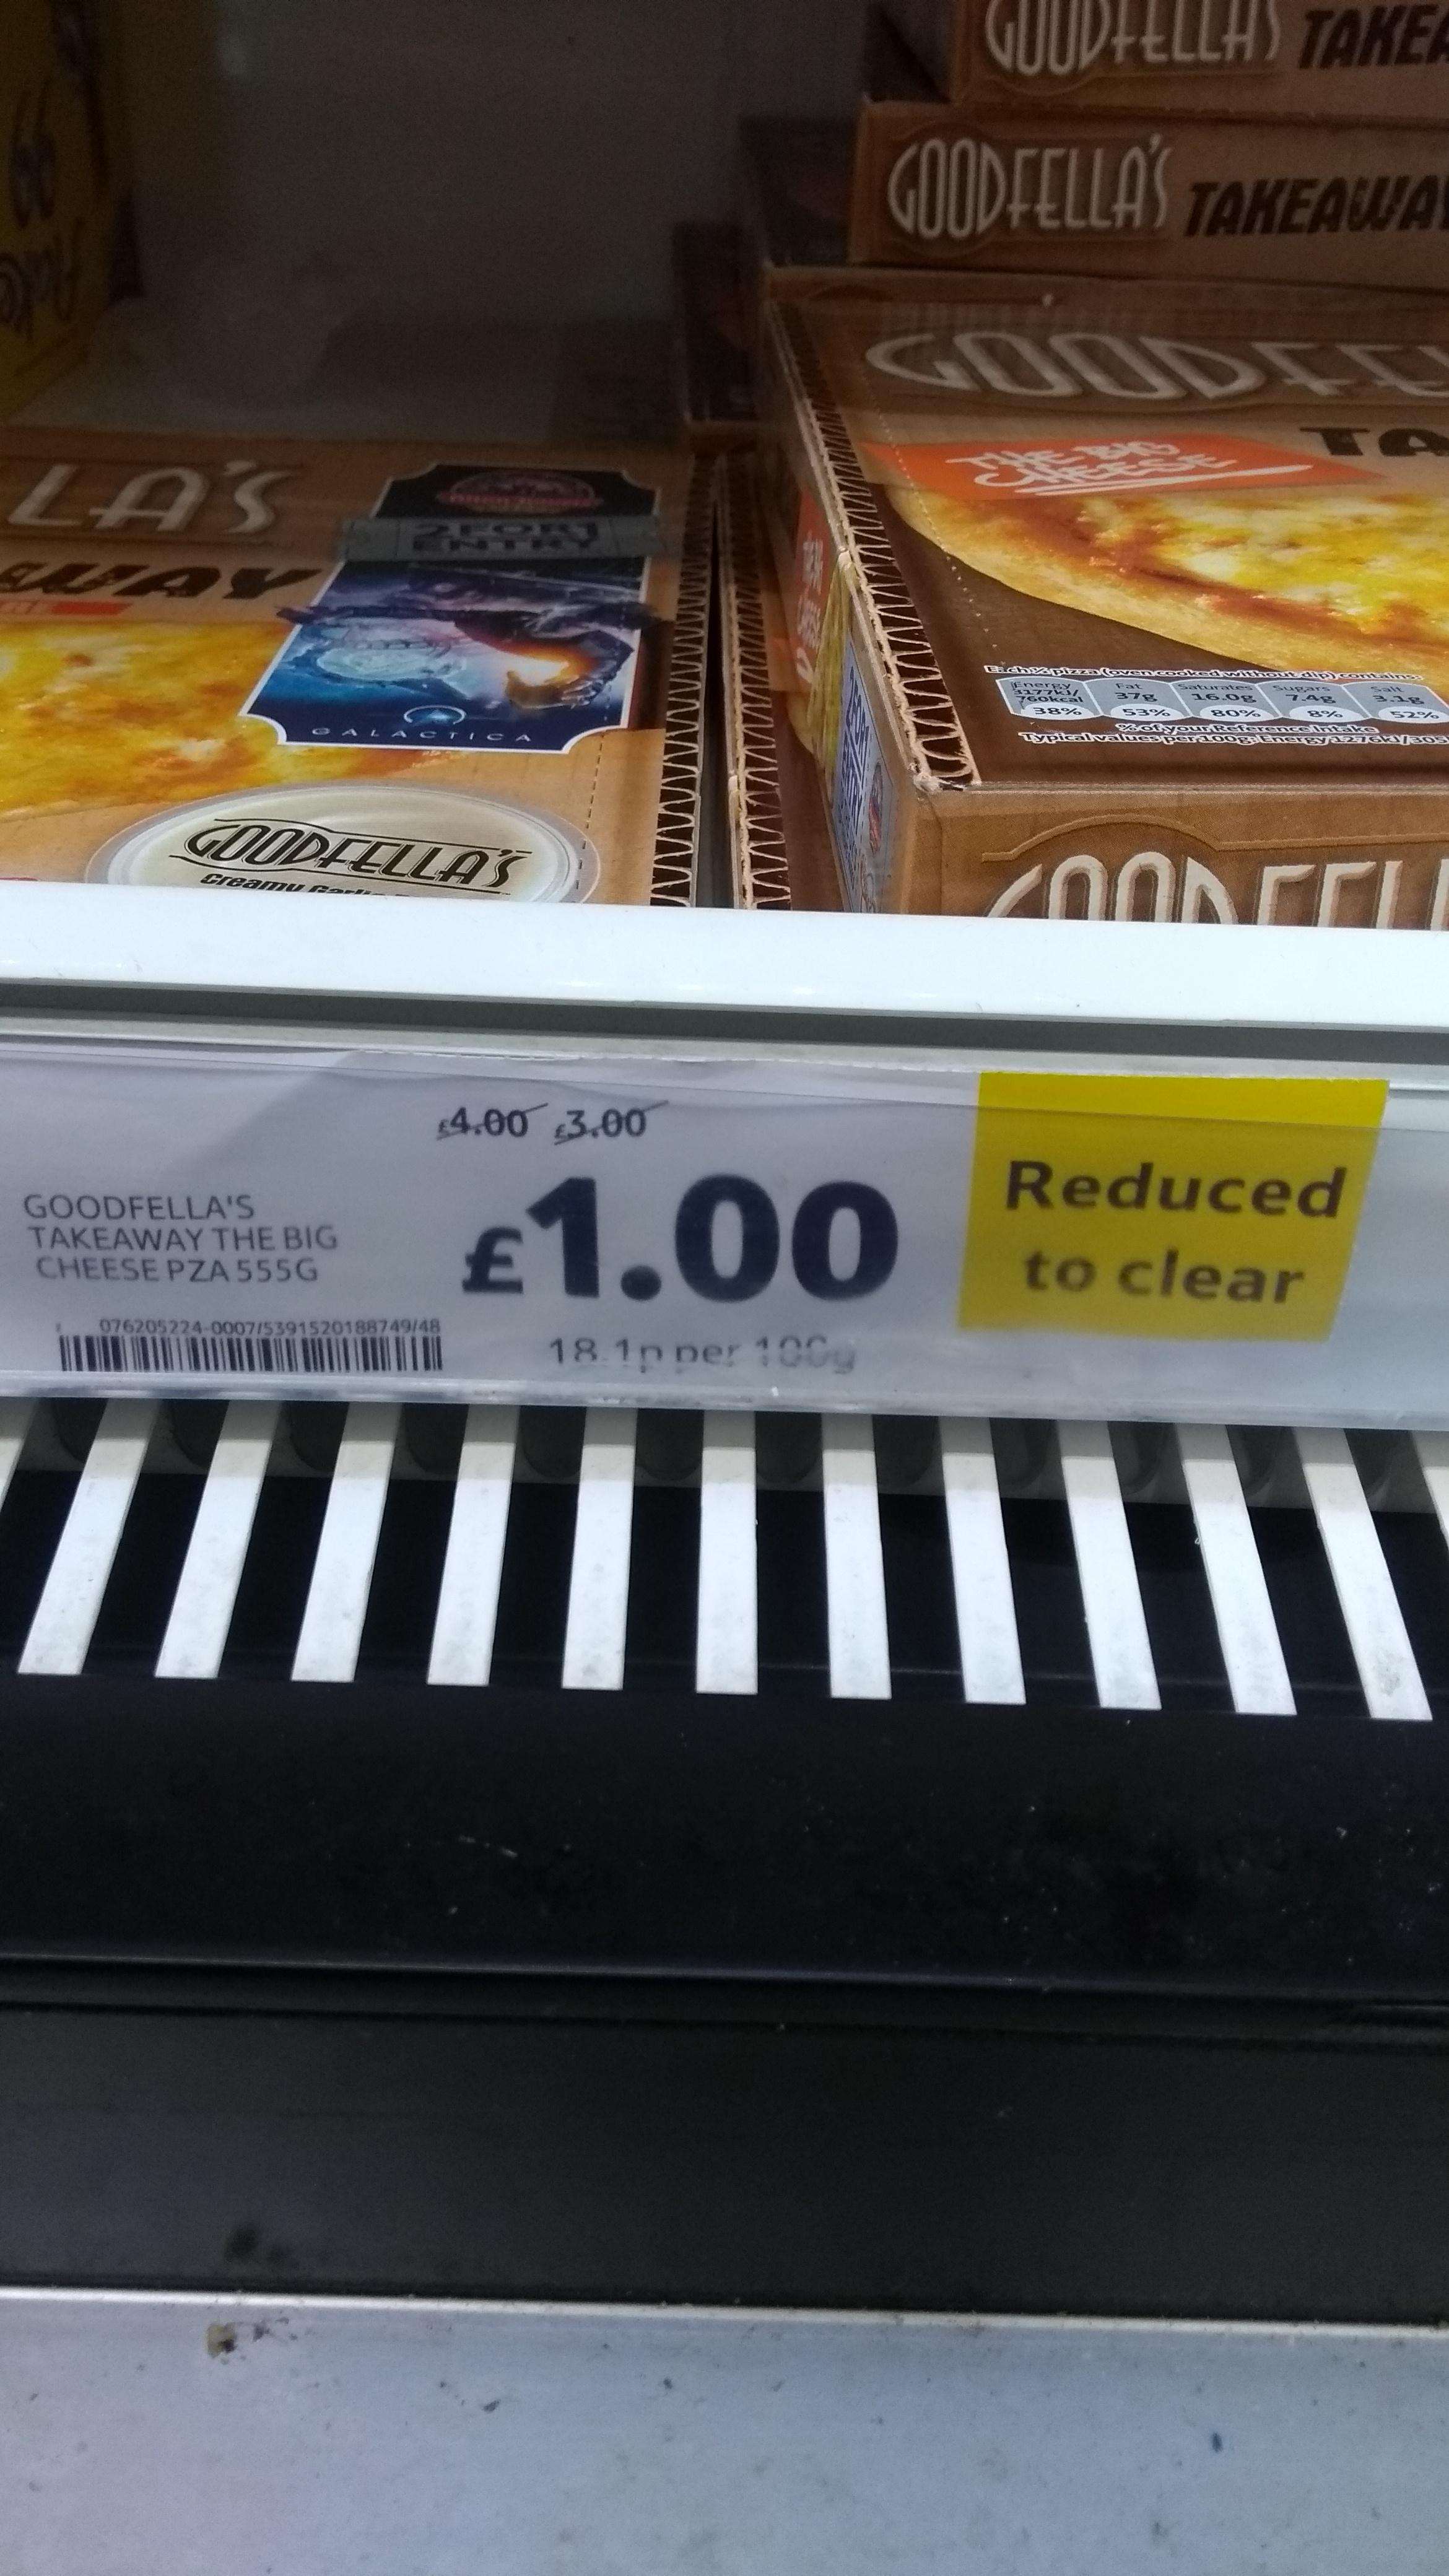 Goodfellas take away pizza - £1 instore @ Tesco (Carlisle)